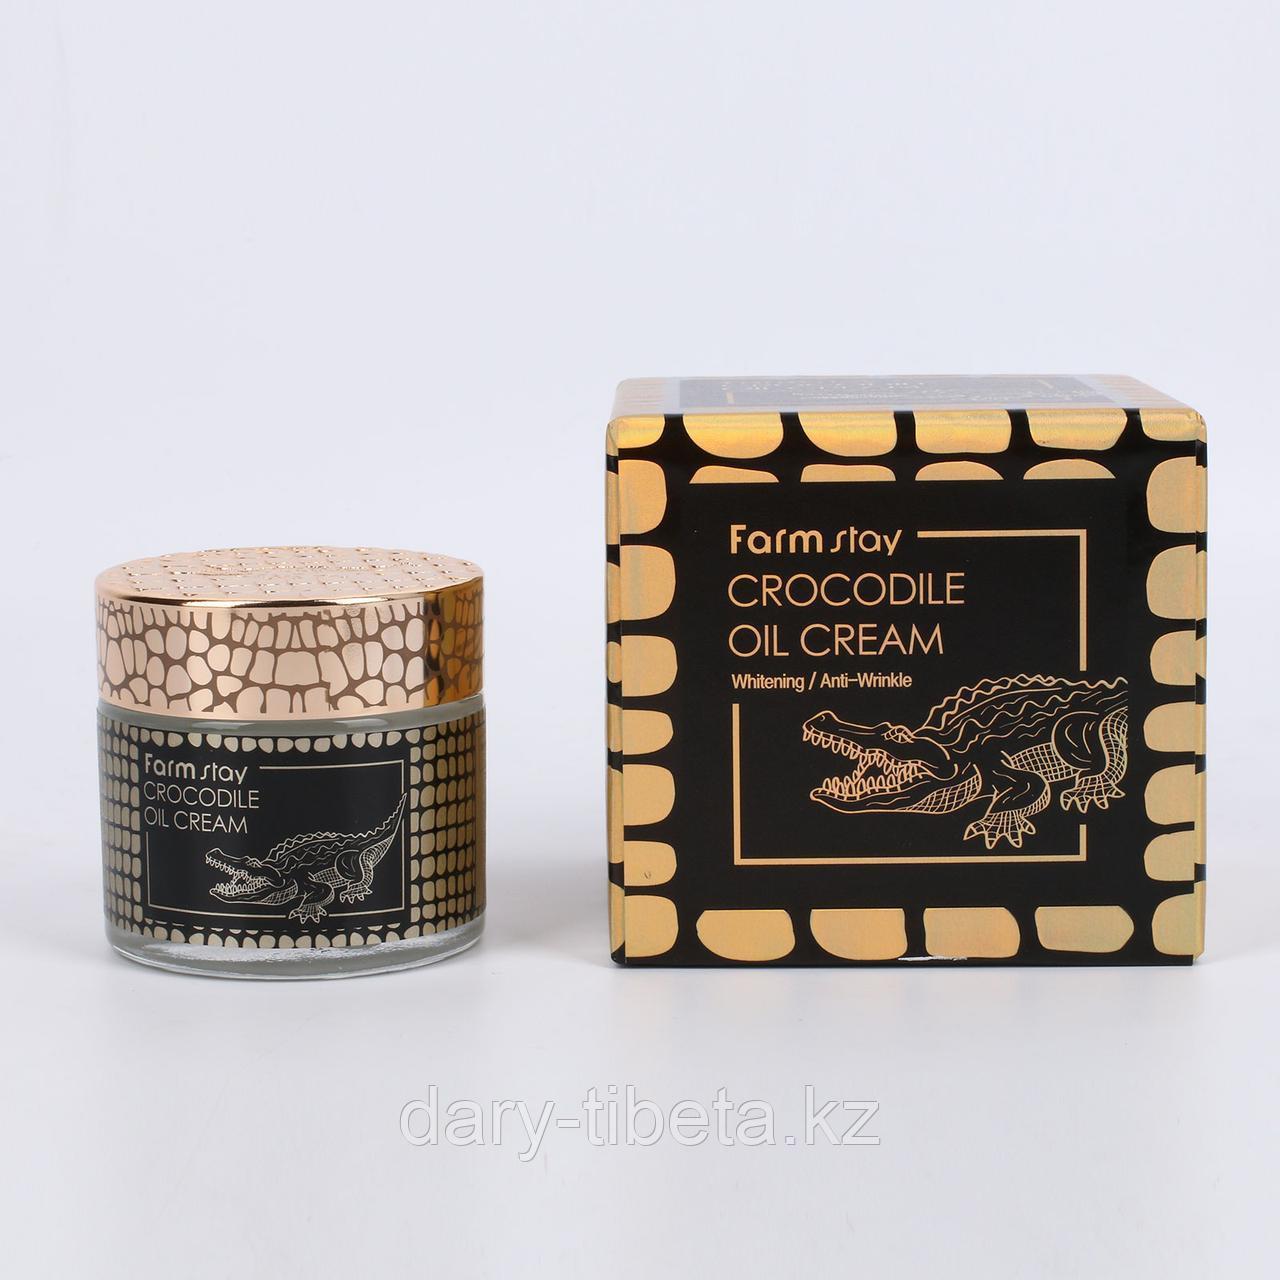 Farm Stay Crocodile Oil Cream- Крем с крокодильим жиром(70гр)